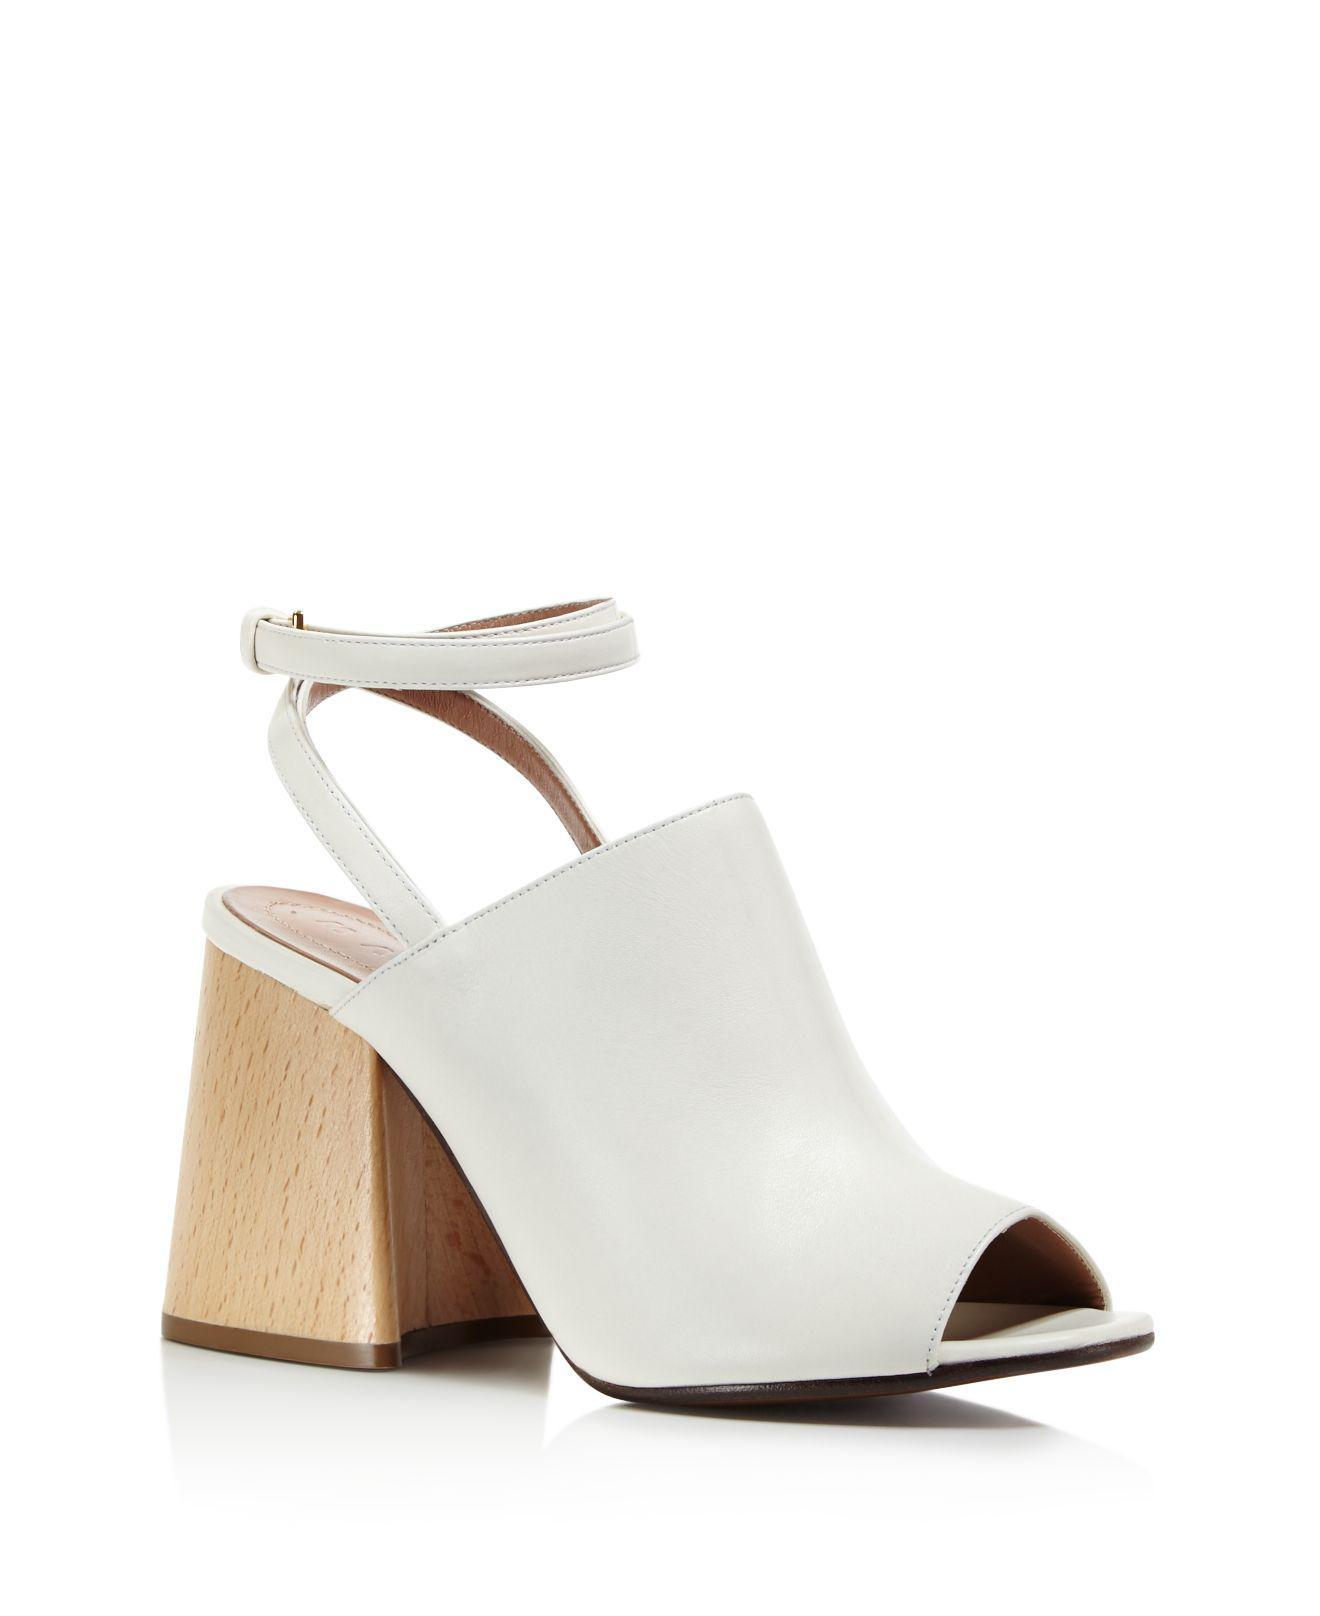 74b86ec33d97 Lyst - Marni Ankle Strap Block Heel Sandals in White